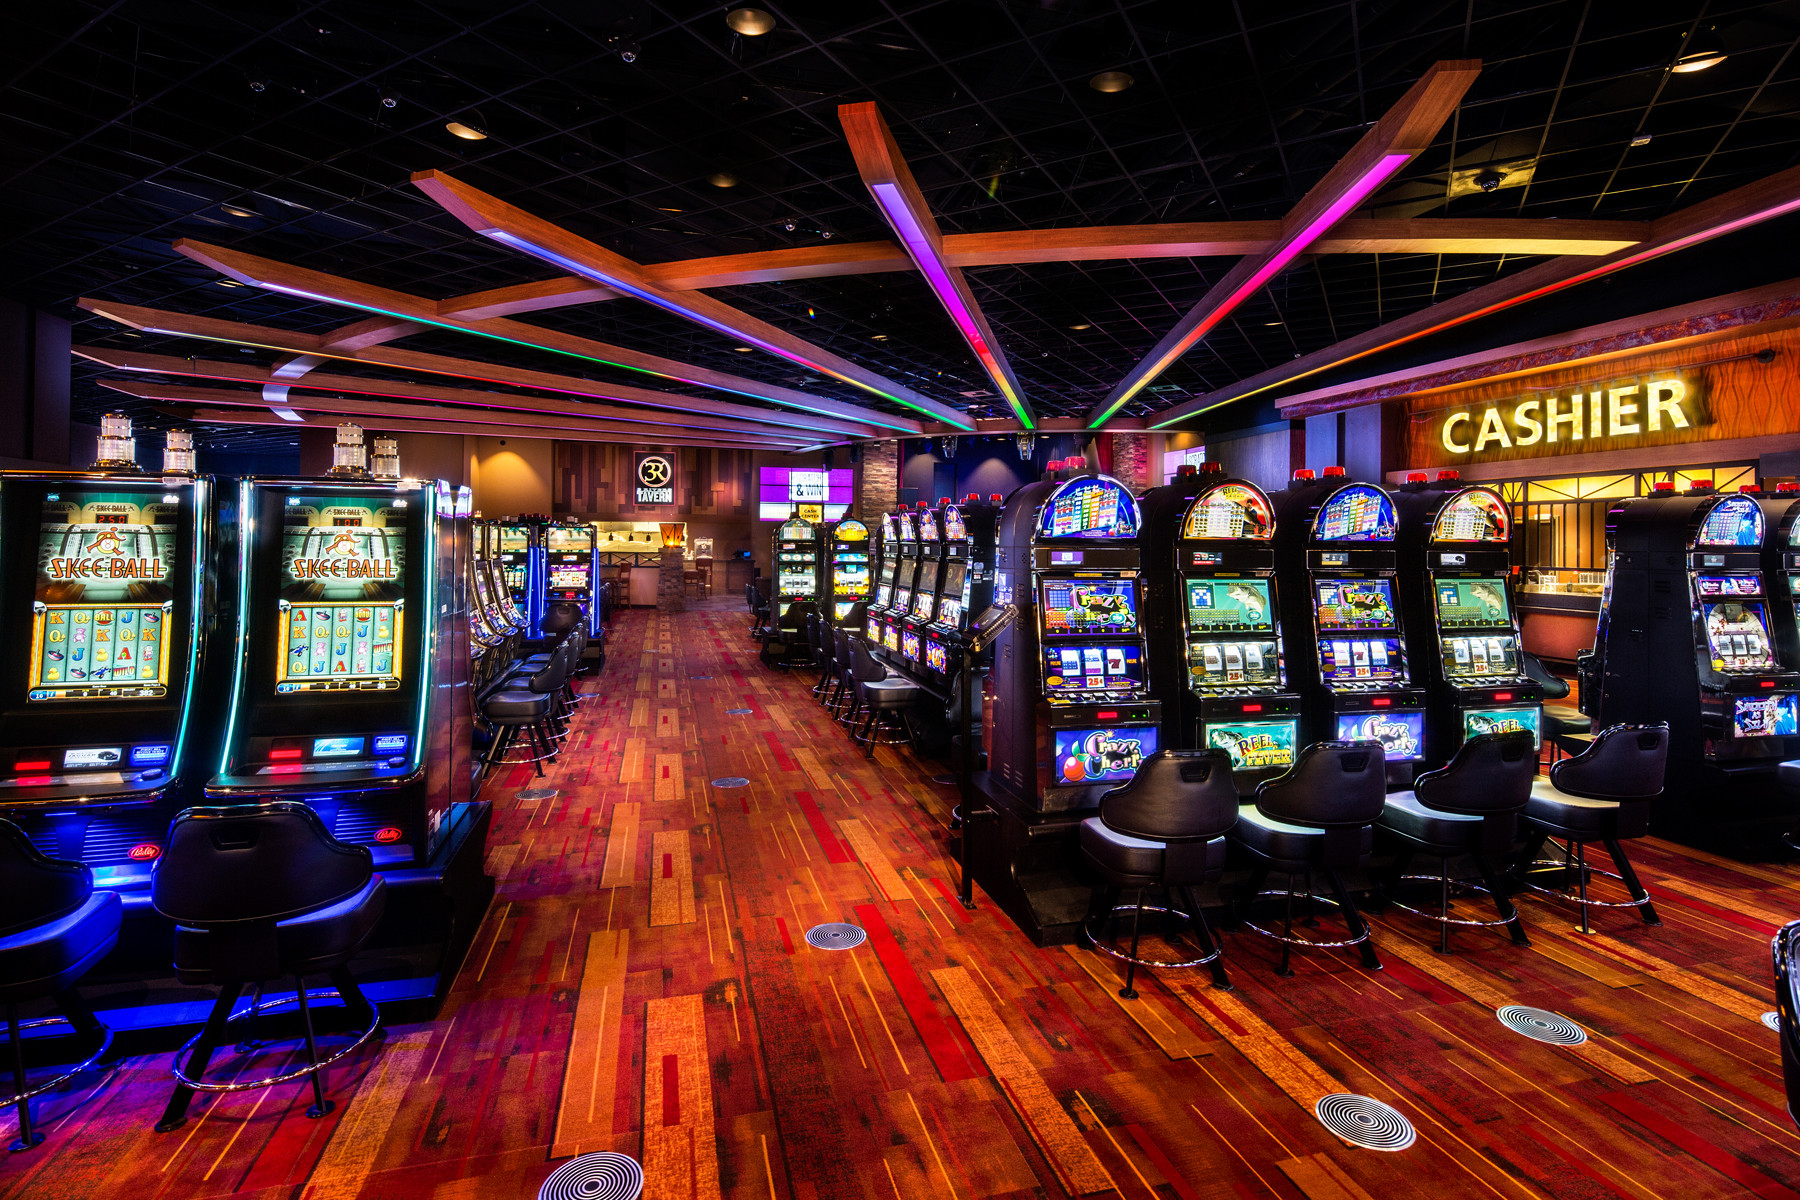 Fort-Gibson-Casino_Interior-Casino-Design_Casino-Design_Casino-Development-1800x1200.jpg